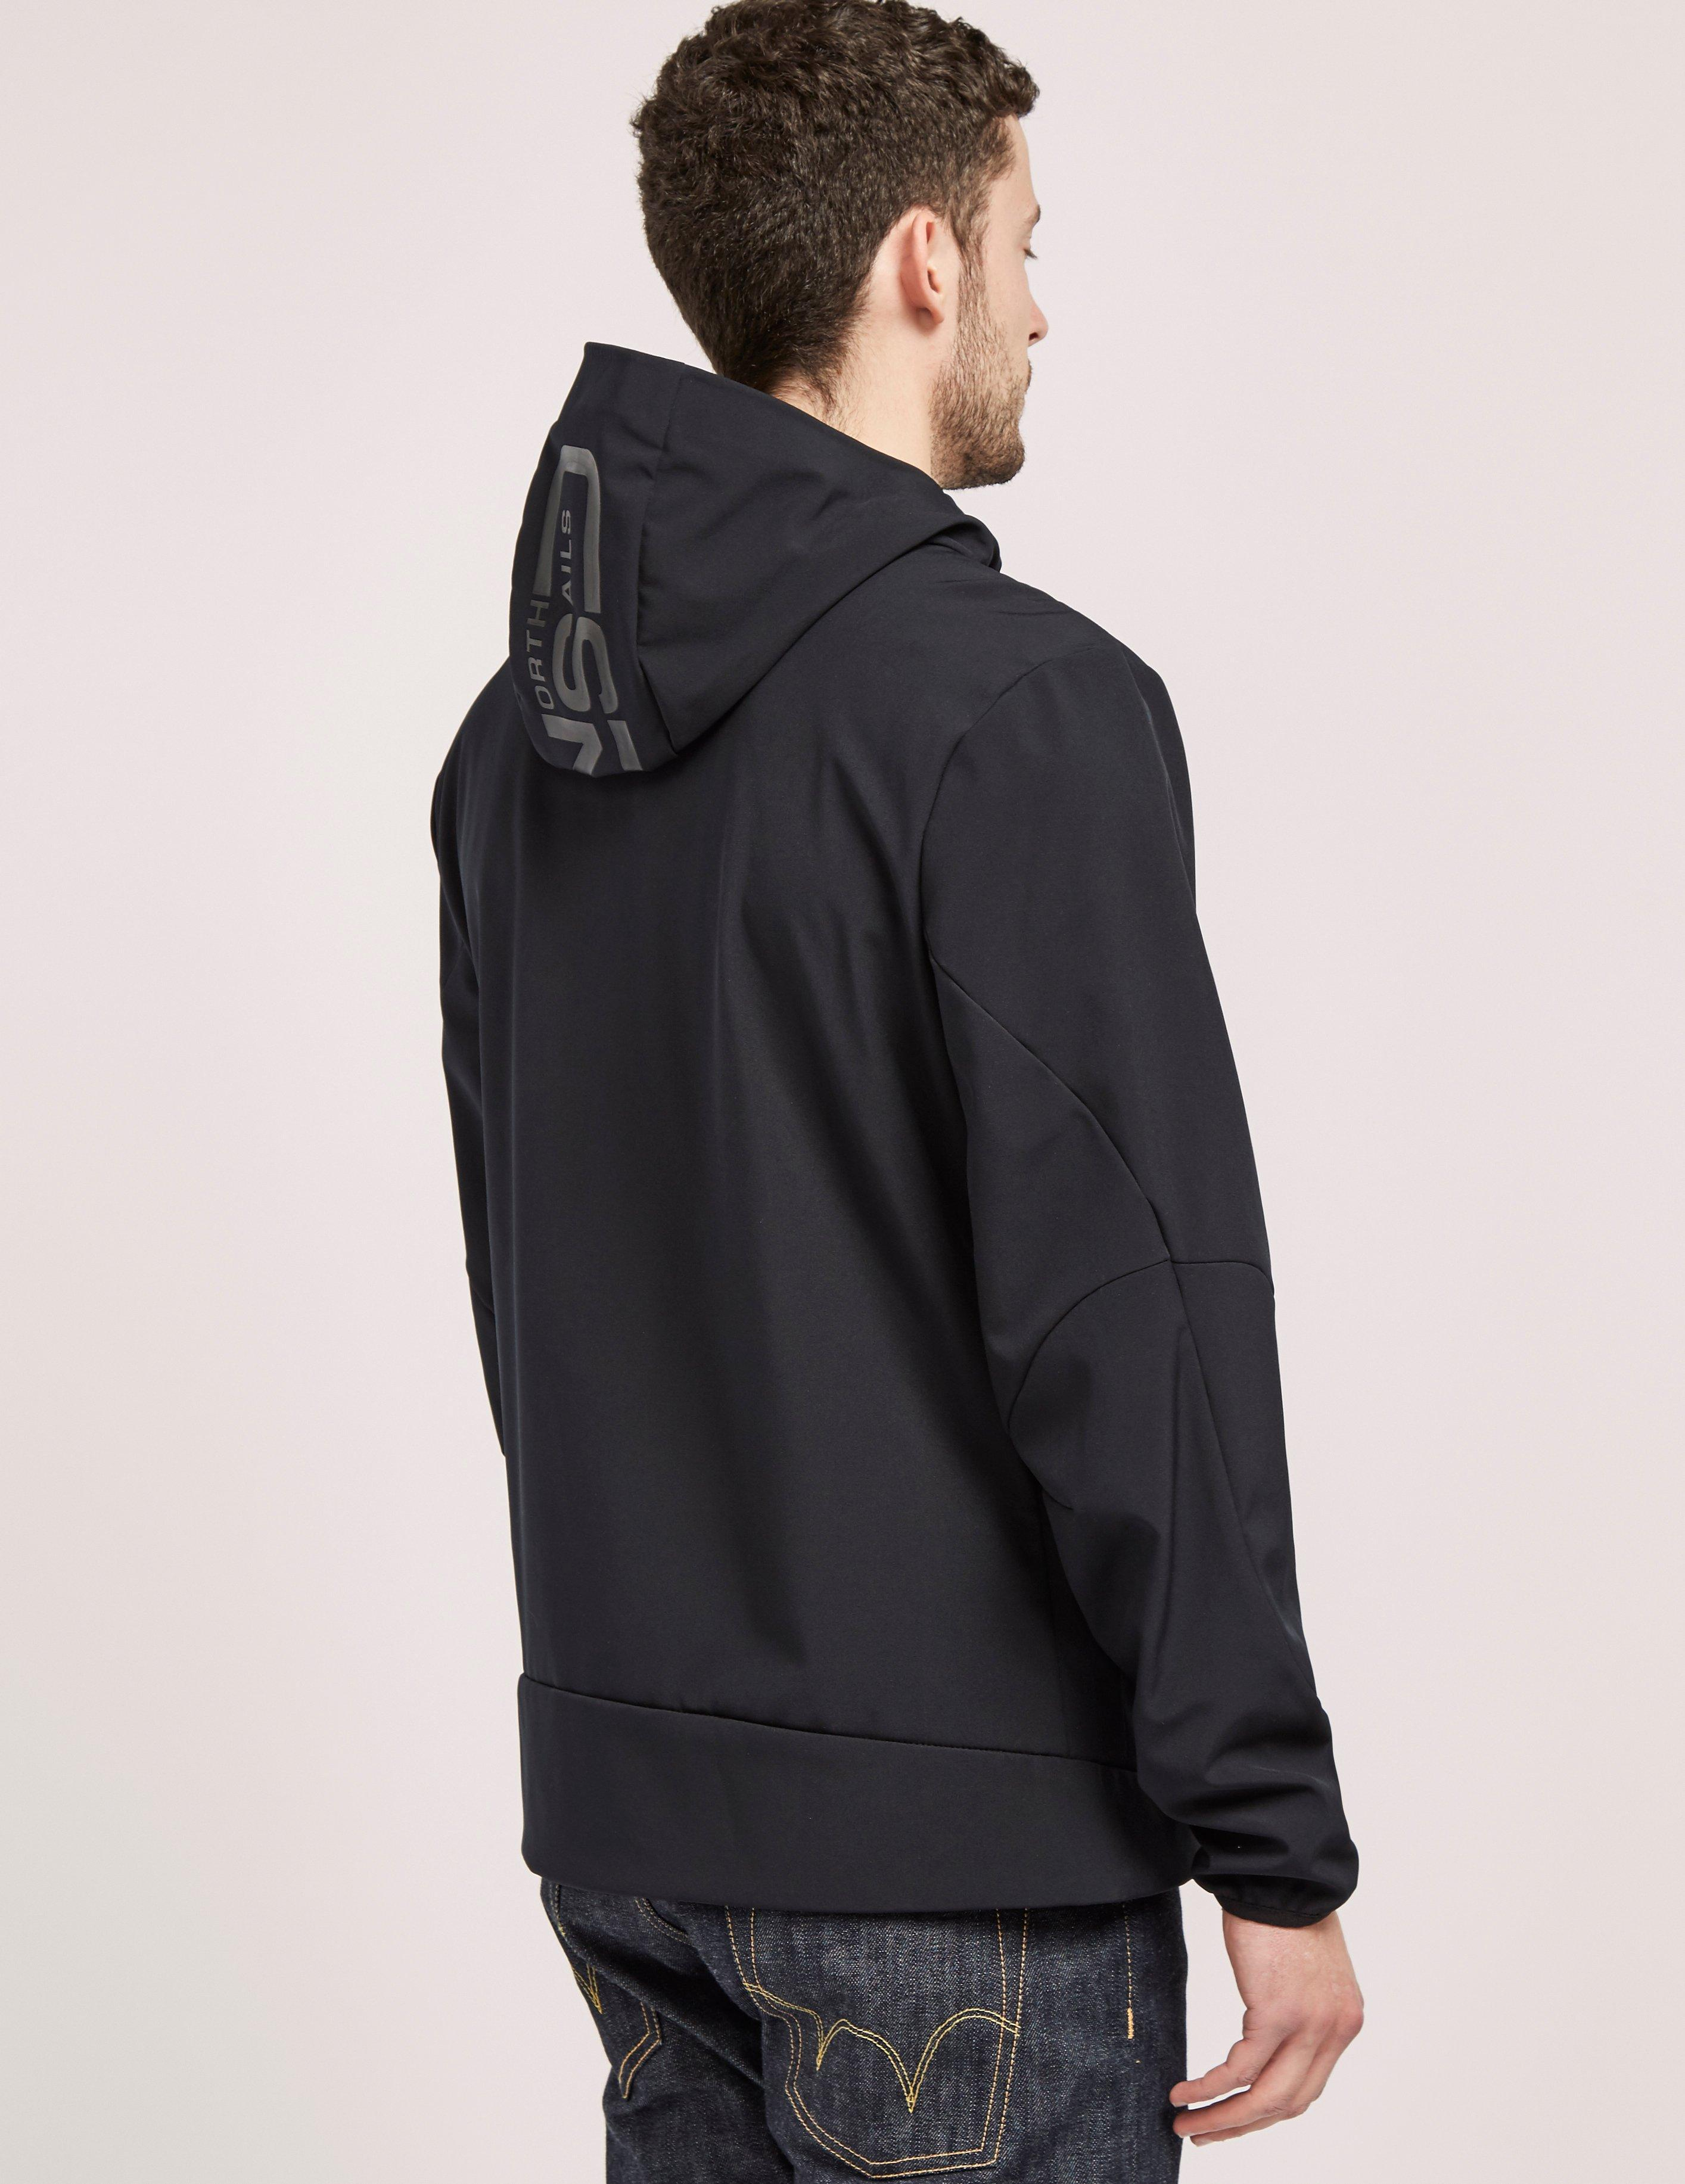 North Sails Full Zip Light Jacket in Black for Men